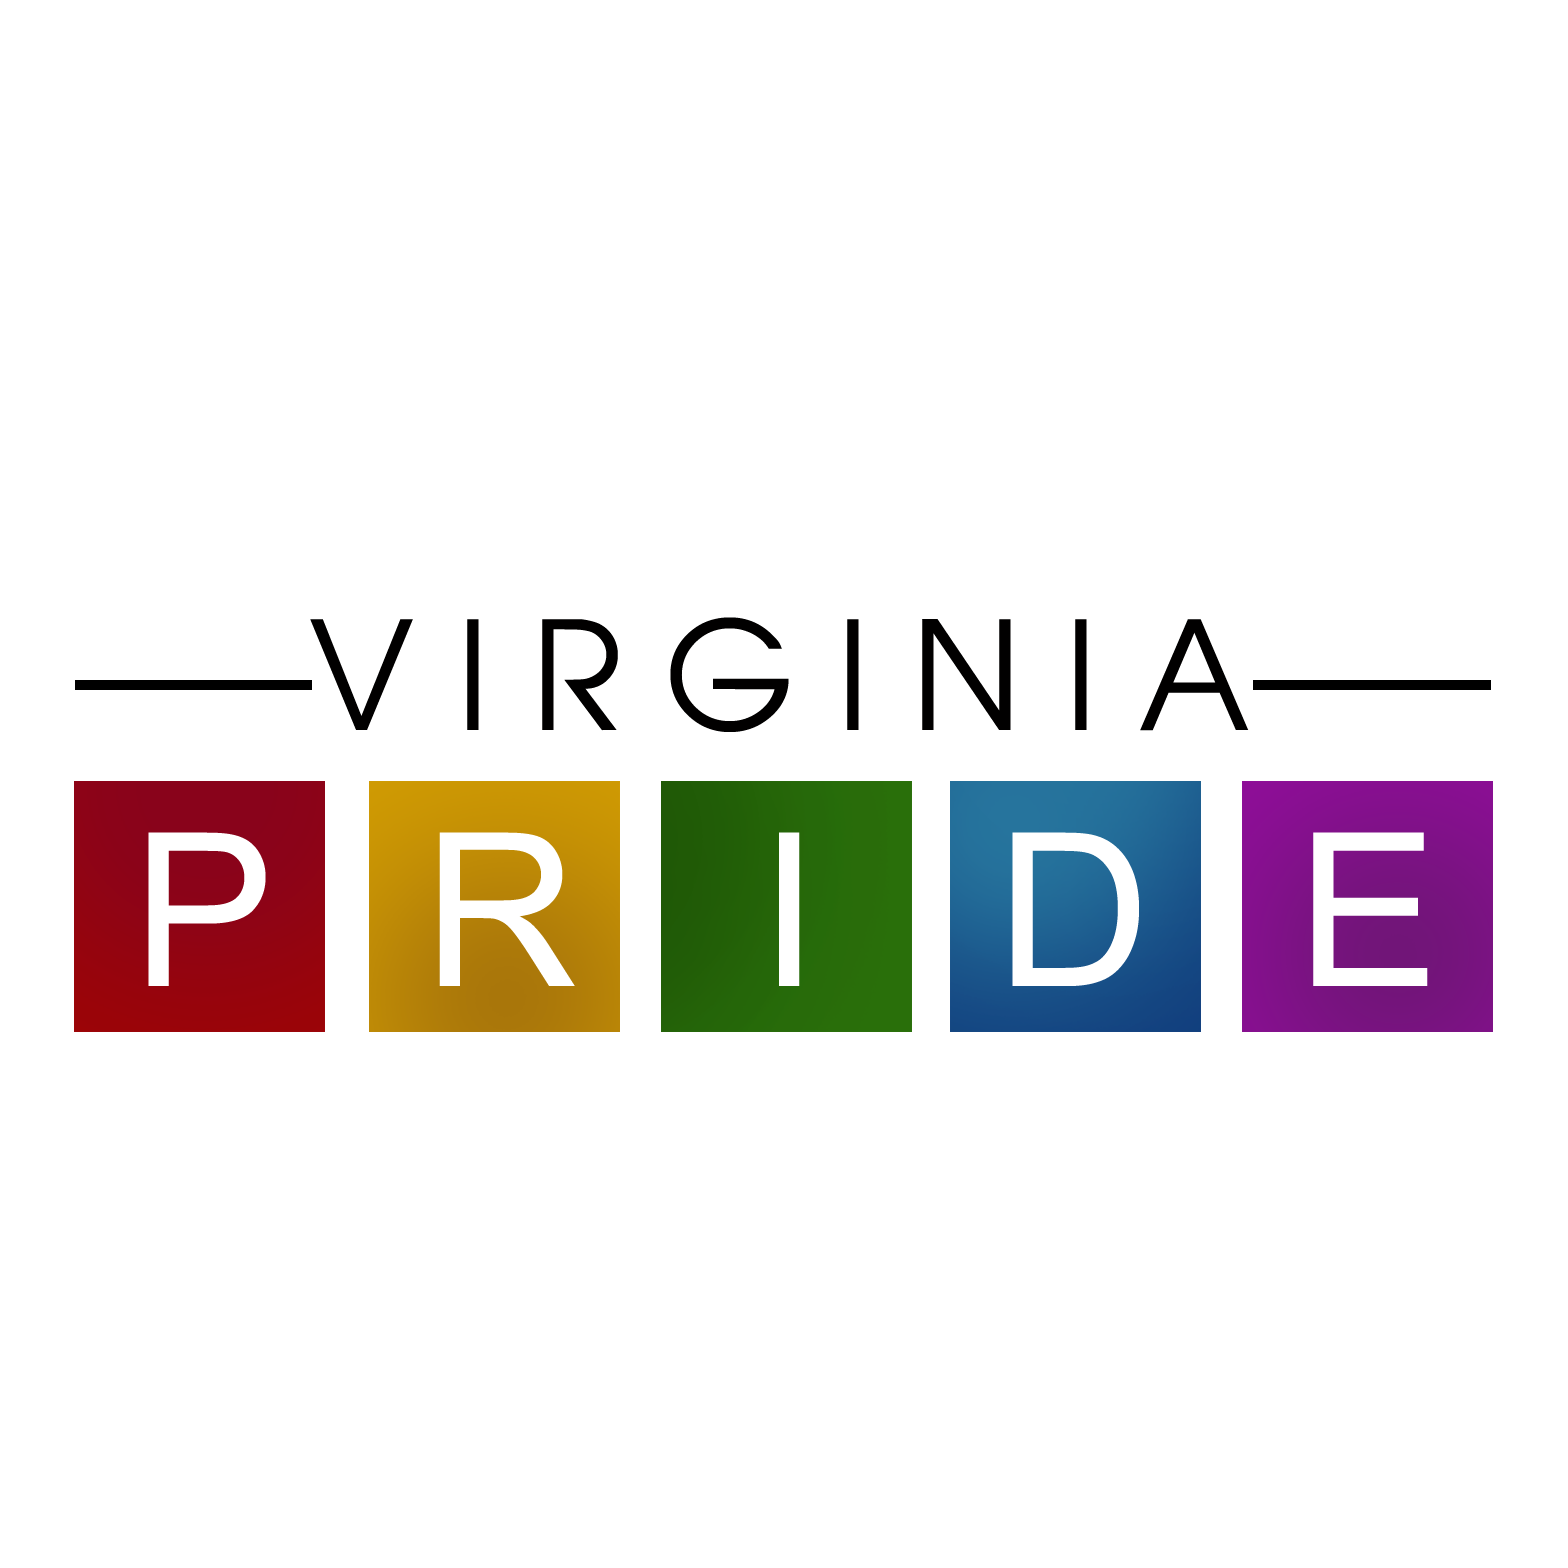 VAPRIDE_logo-SquareLG.png